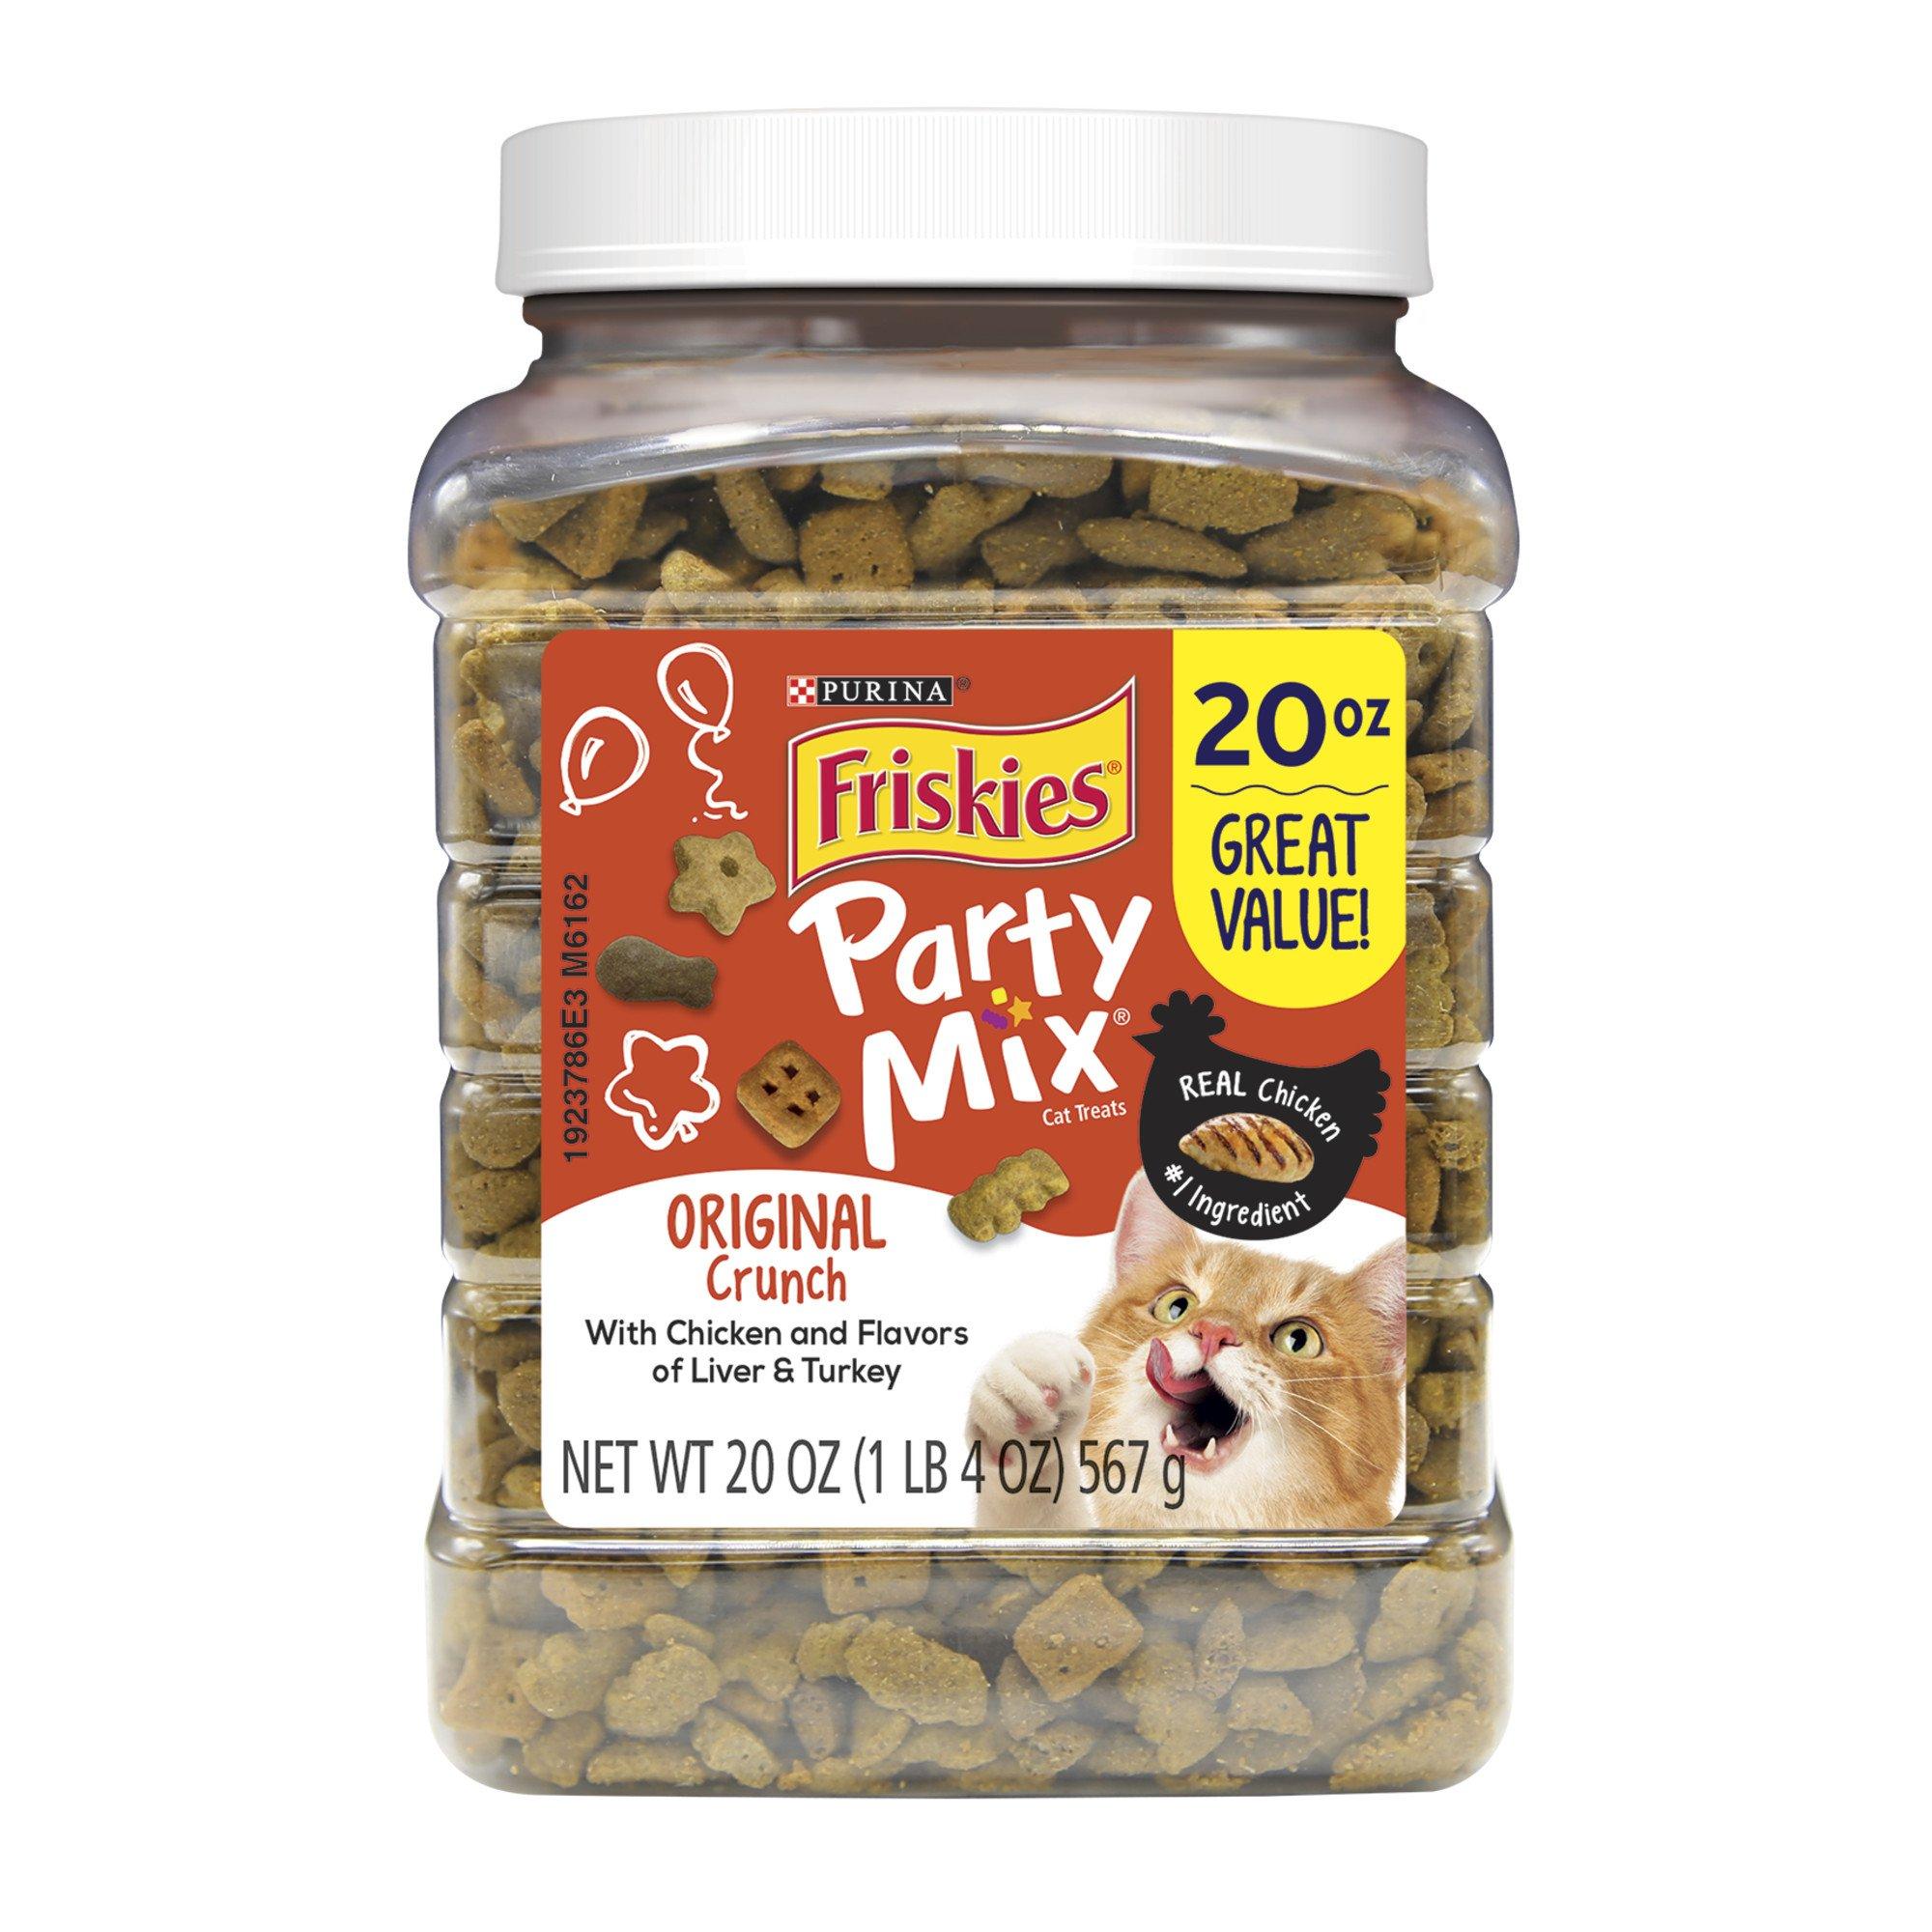 Purina Friskies Party Mix Crunch Original Cat Treats